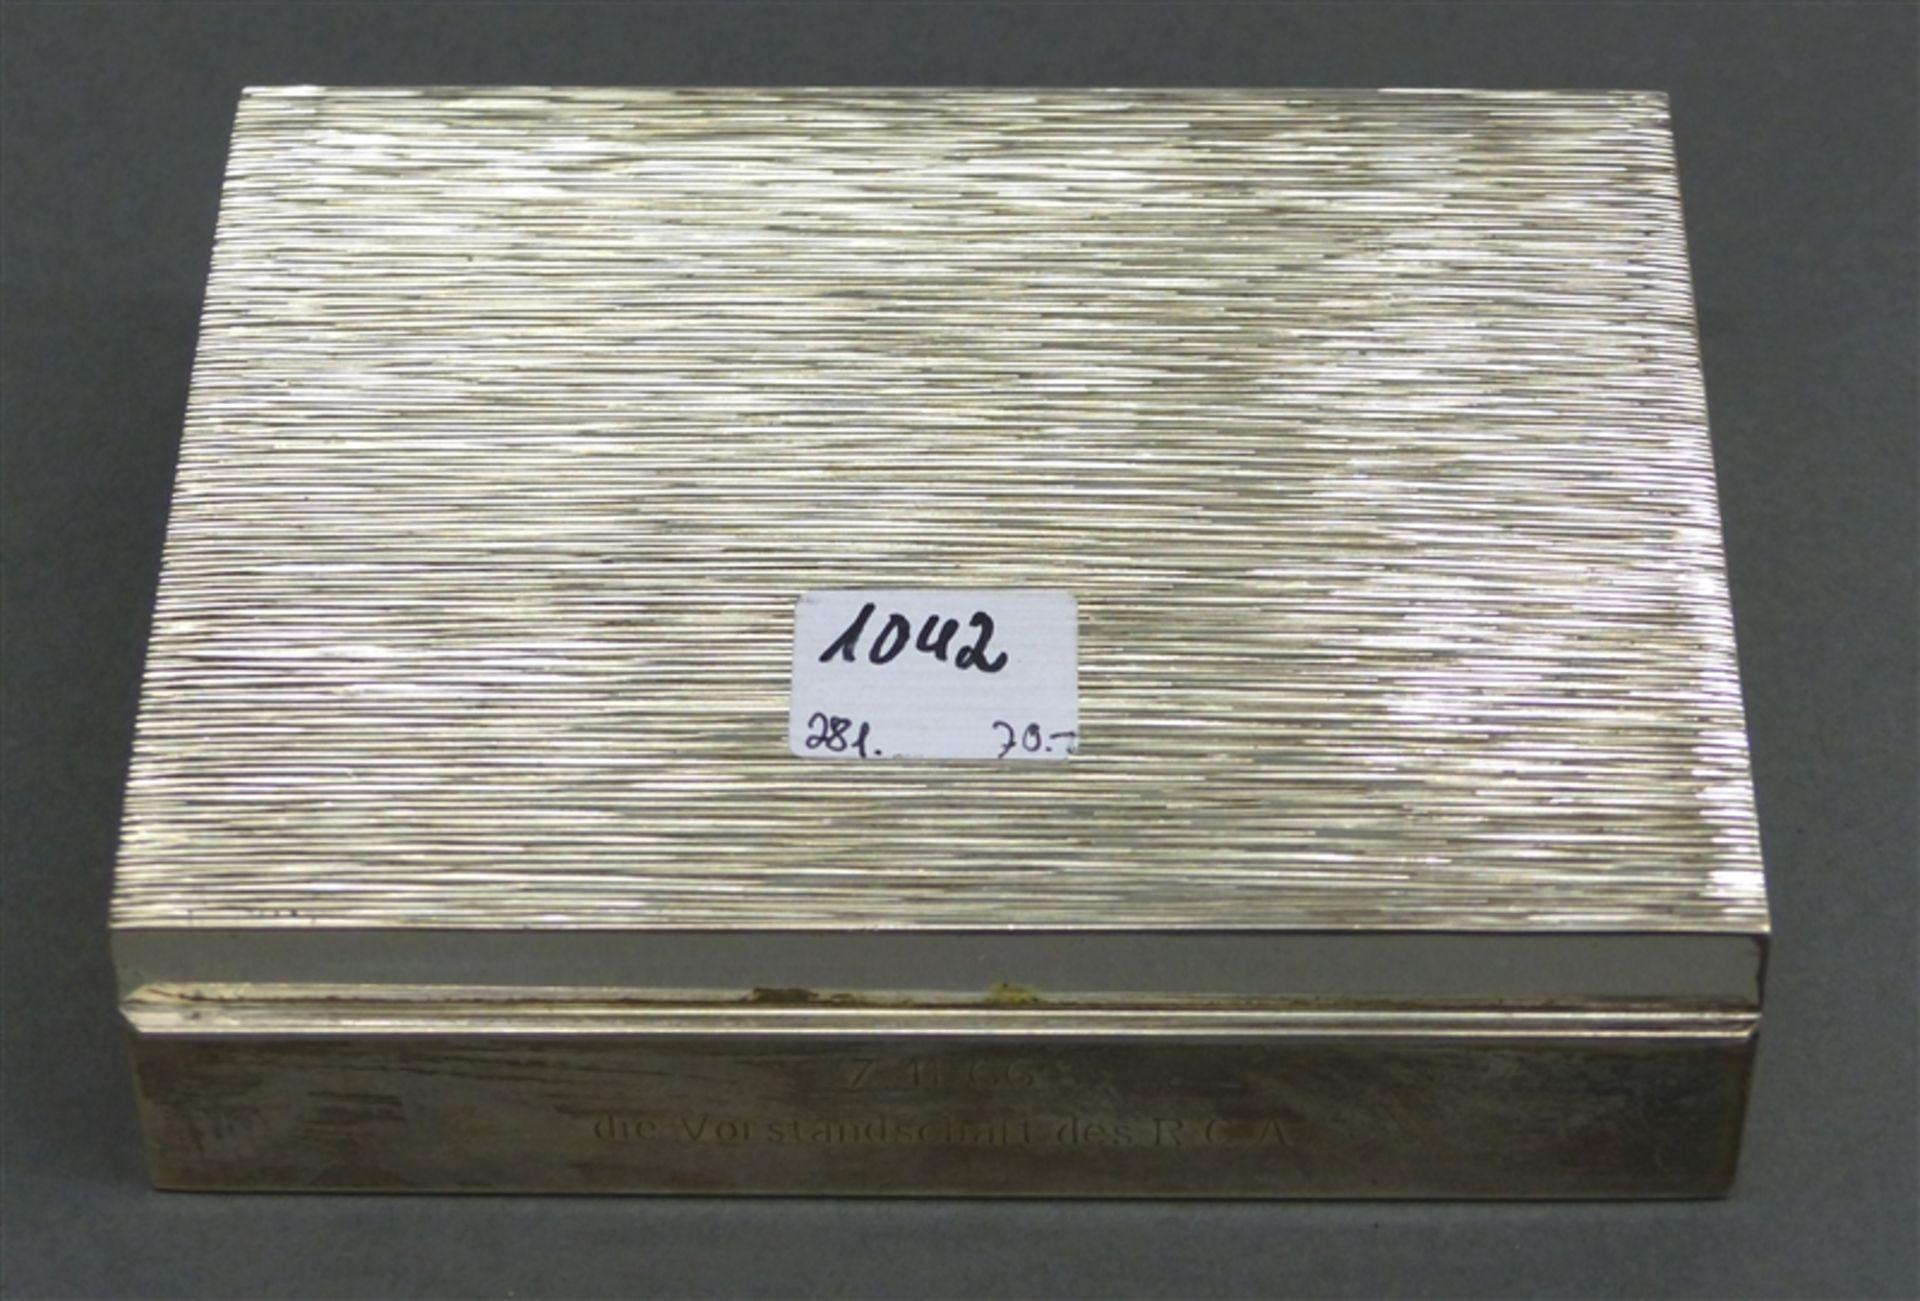 Schatulle Silber, punziert, Inneneinteilung, Holz, Rillendekor, graviert, 12,5x10 cm,